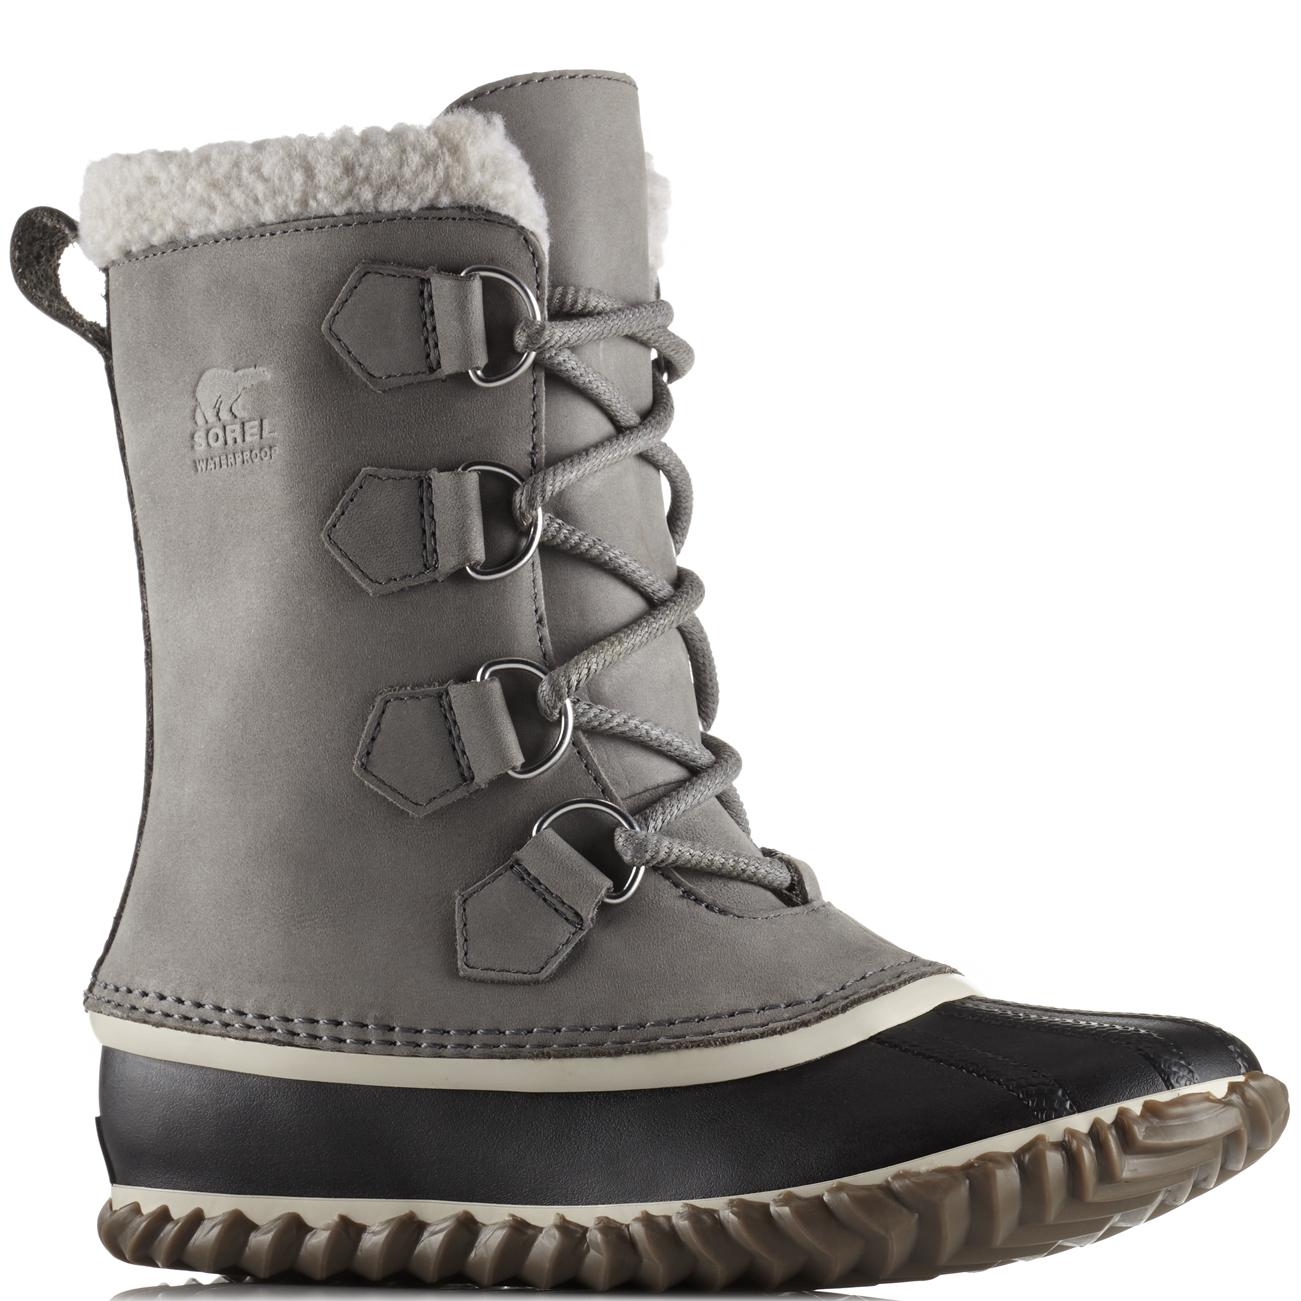 Damenschuhe Sorel Caribou Slim Mid Nubuck Waterproof Winter Hiking Mid Slim Calf Stiefel UK 3-9 e86afb